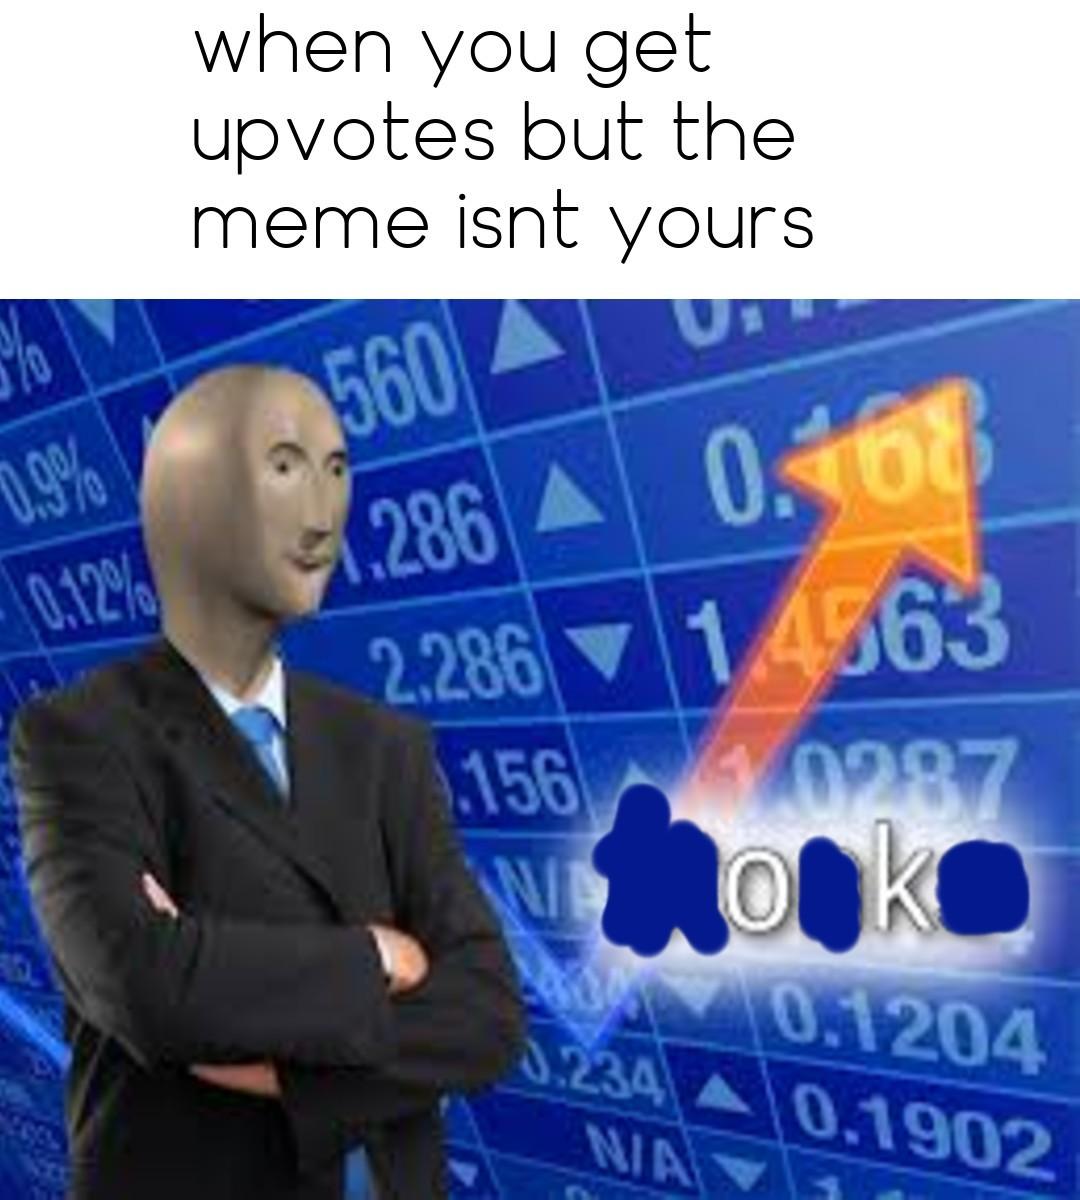 reposters wya - meme